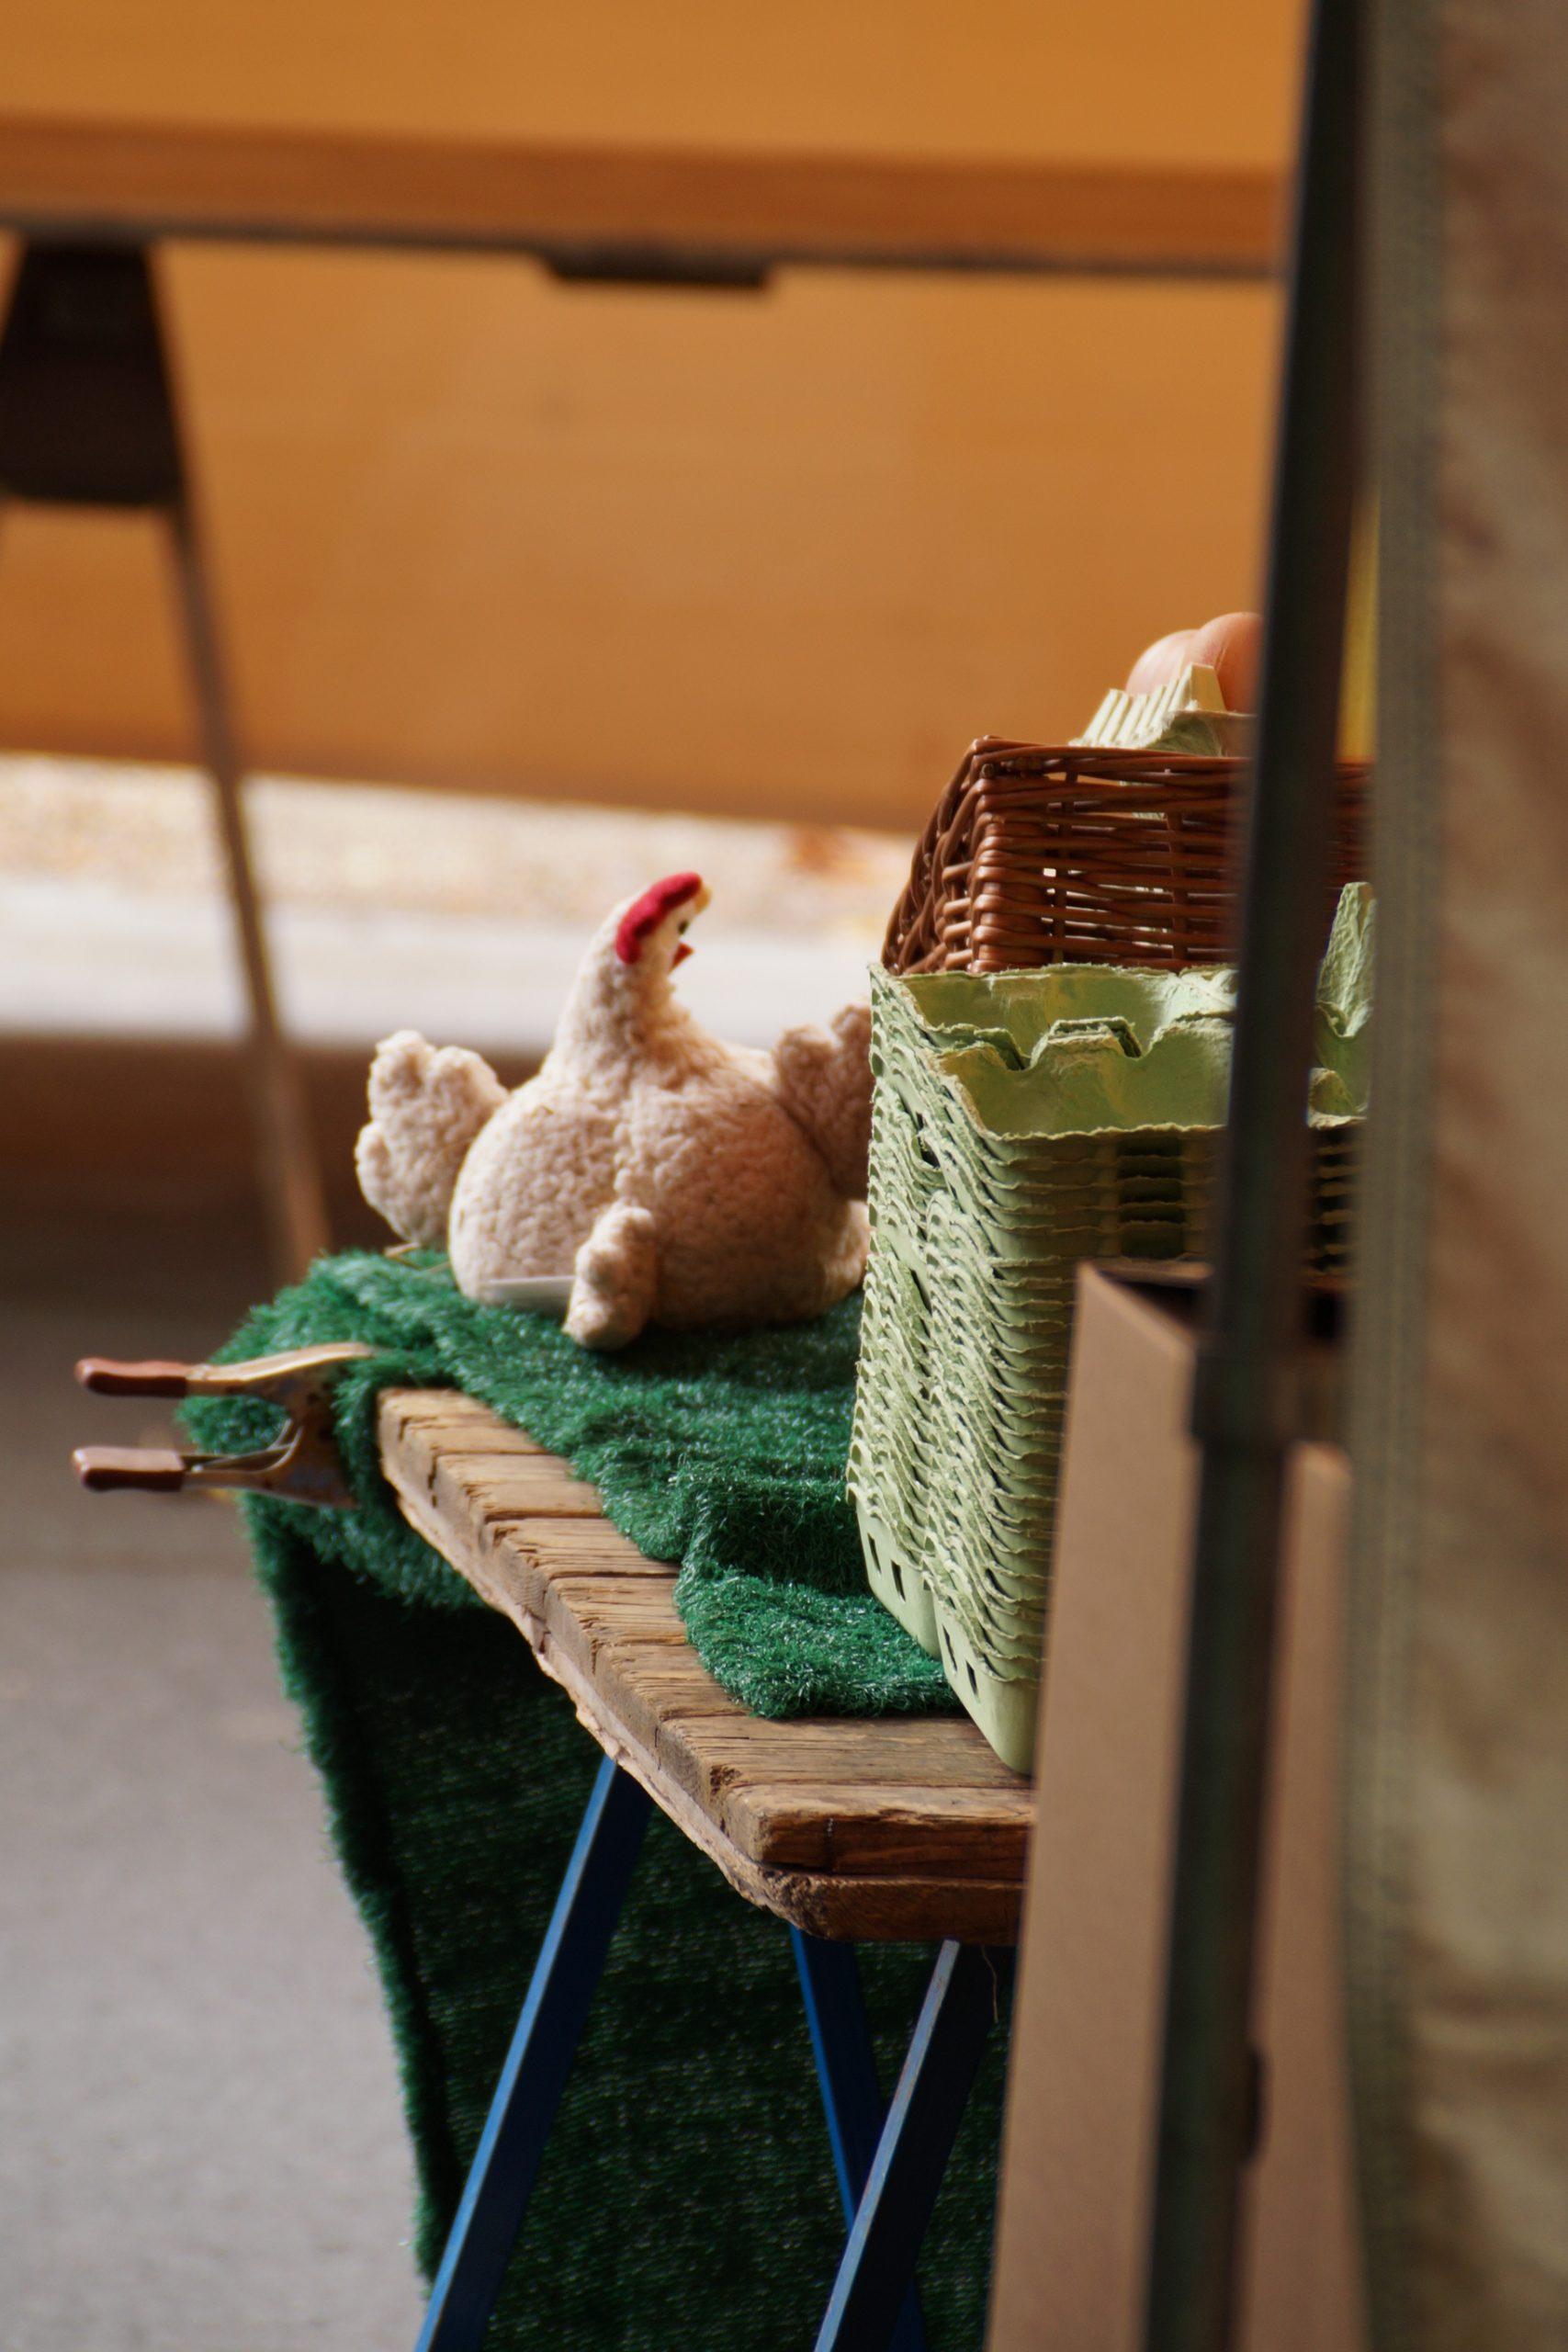 Soft toy, hen, Berlin